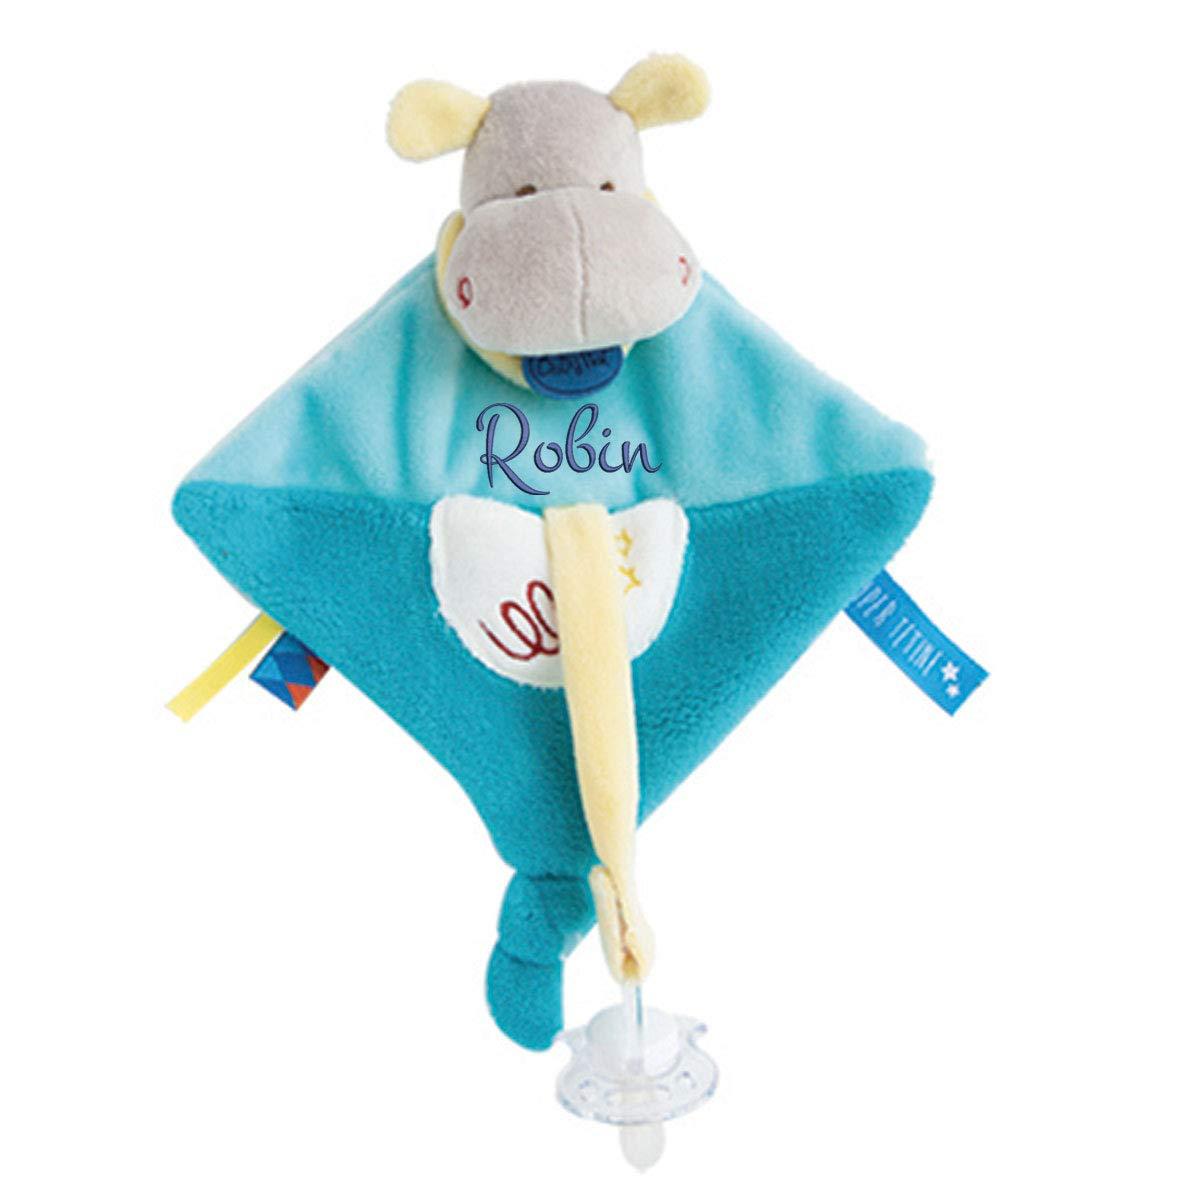 Doudou Hippo attache porte tétine à broder avec prénom- cadeau liste de naissance - cadeau personnalisé naissance - cadeau personnalisé bébé